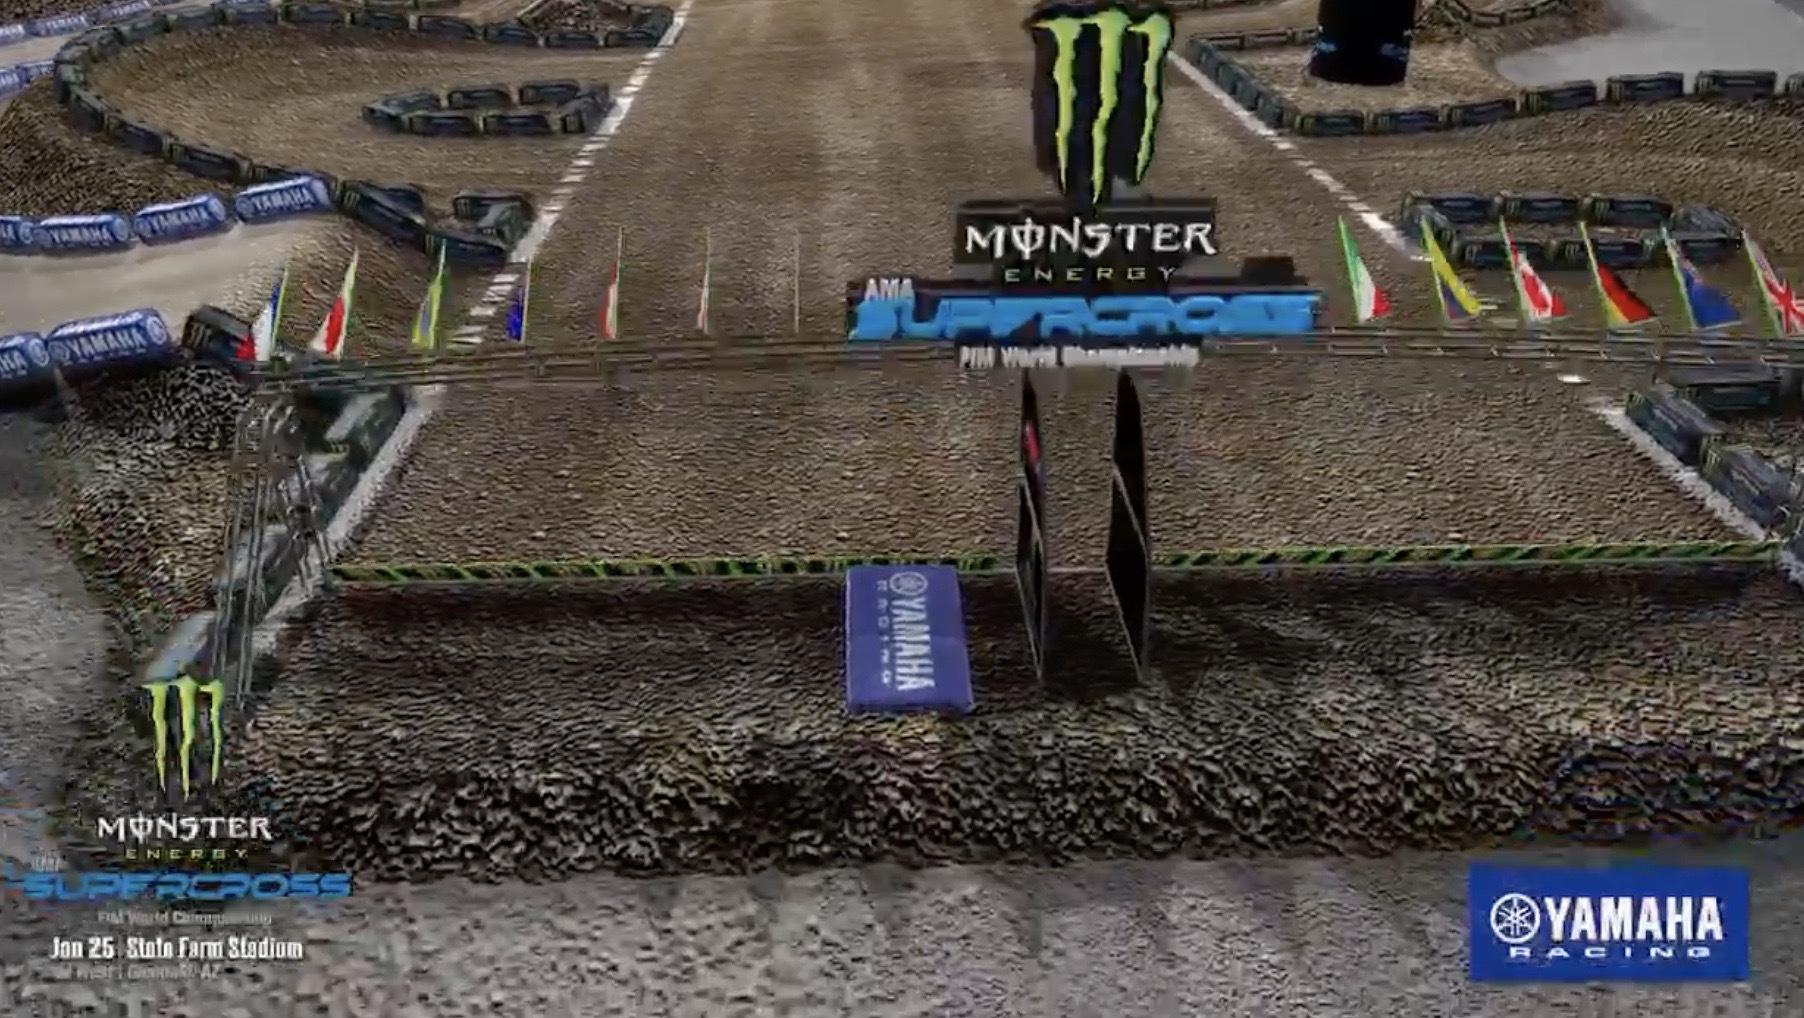 2020 Glendale Supercross - Animated Track Map